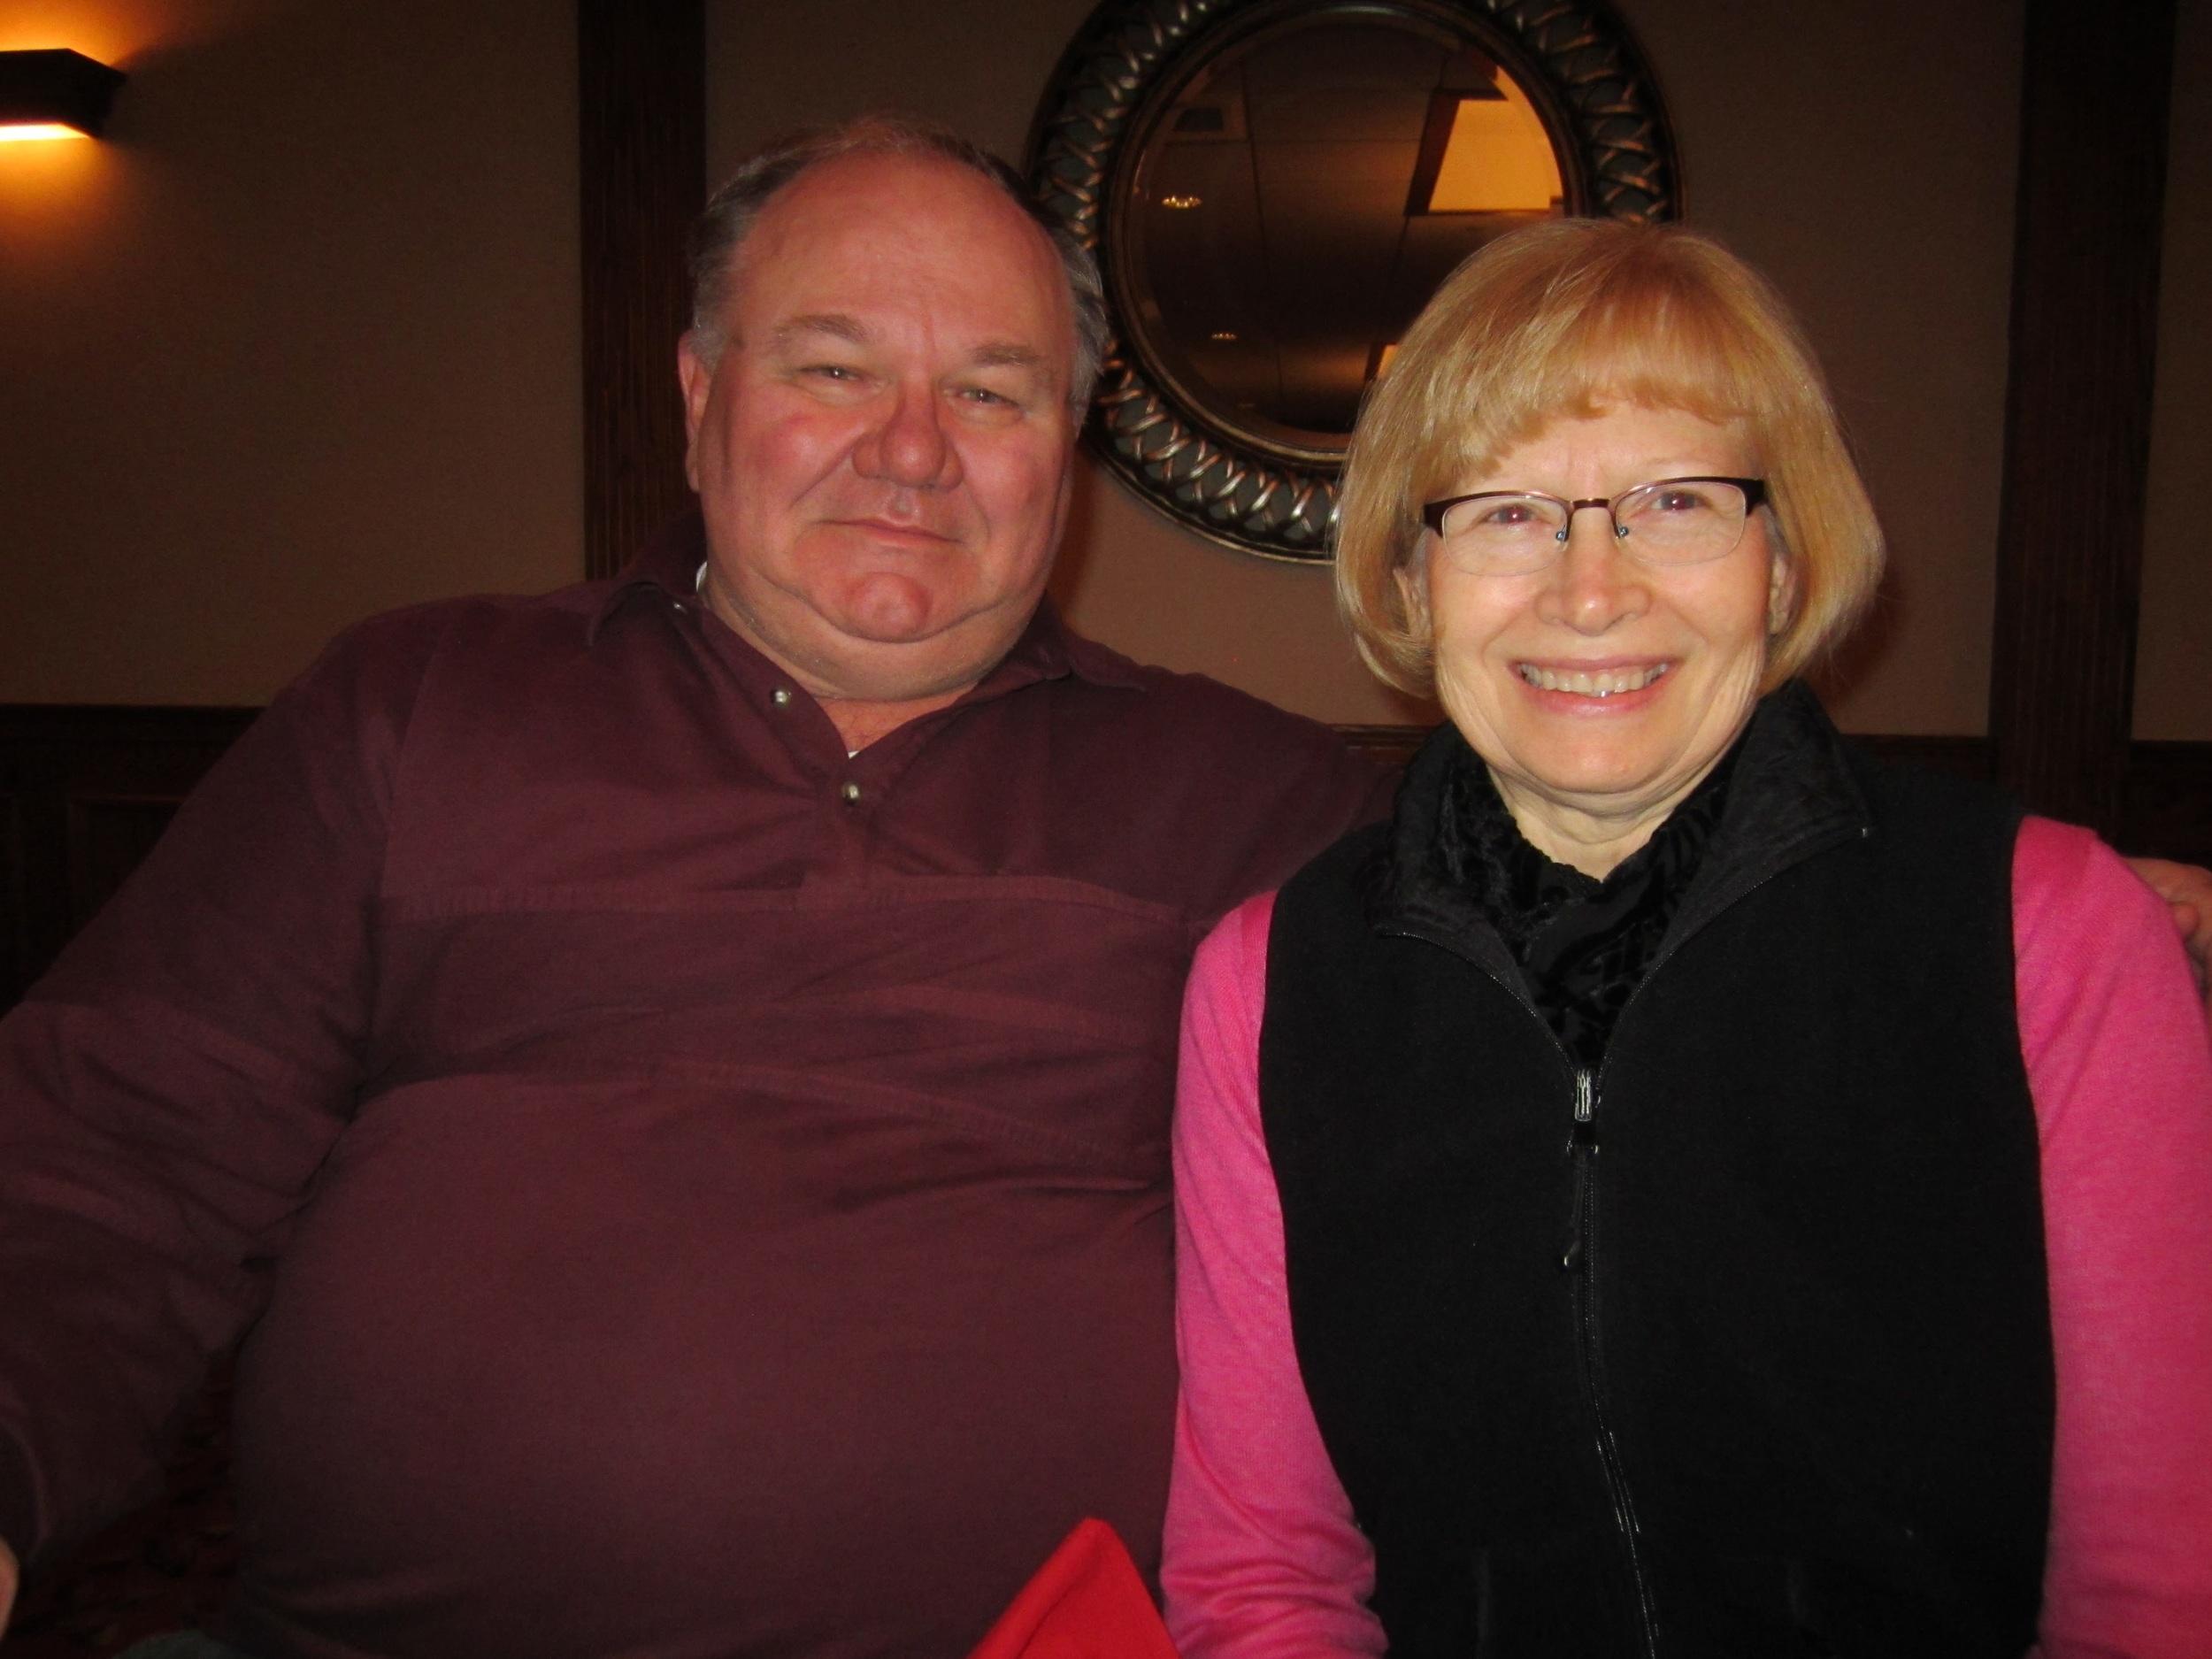 Ron & Susan (Vonk) Hohenbery